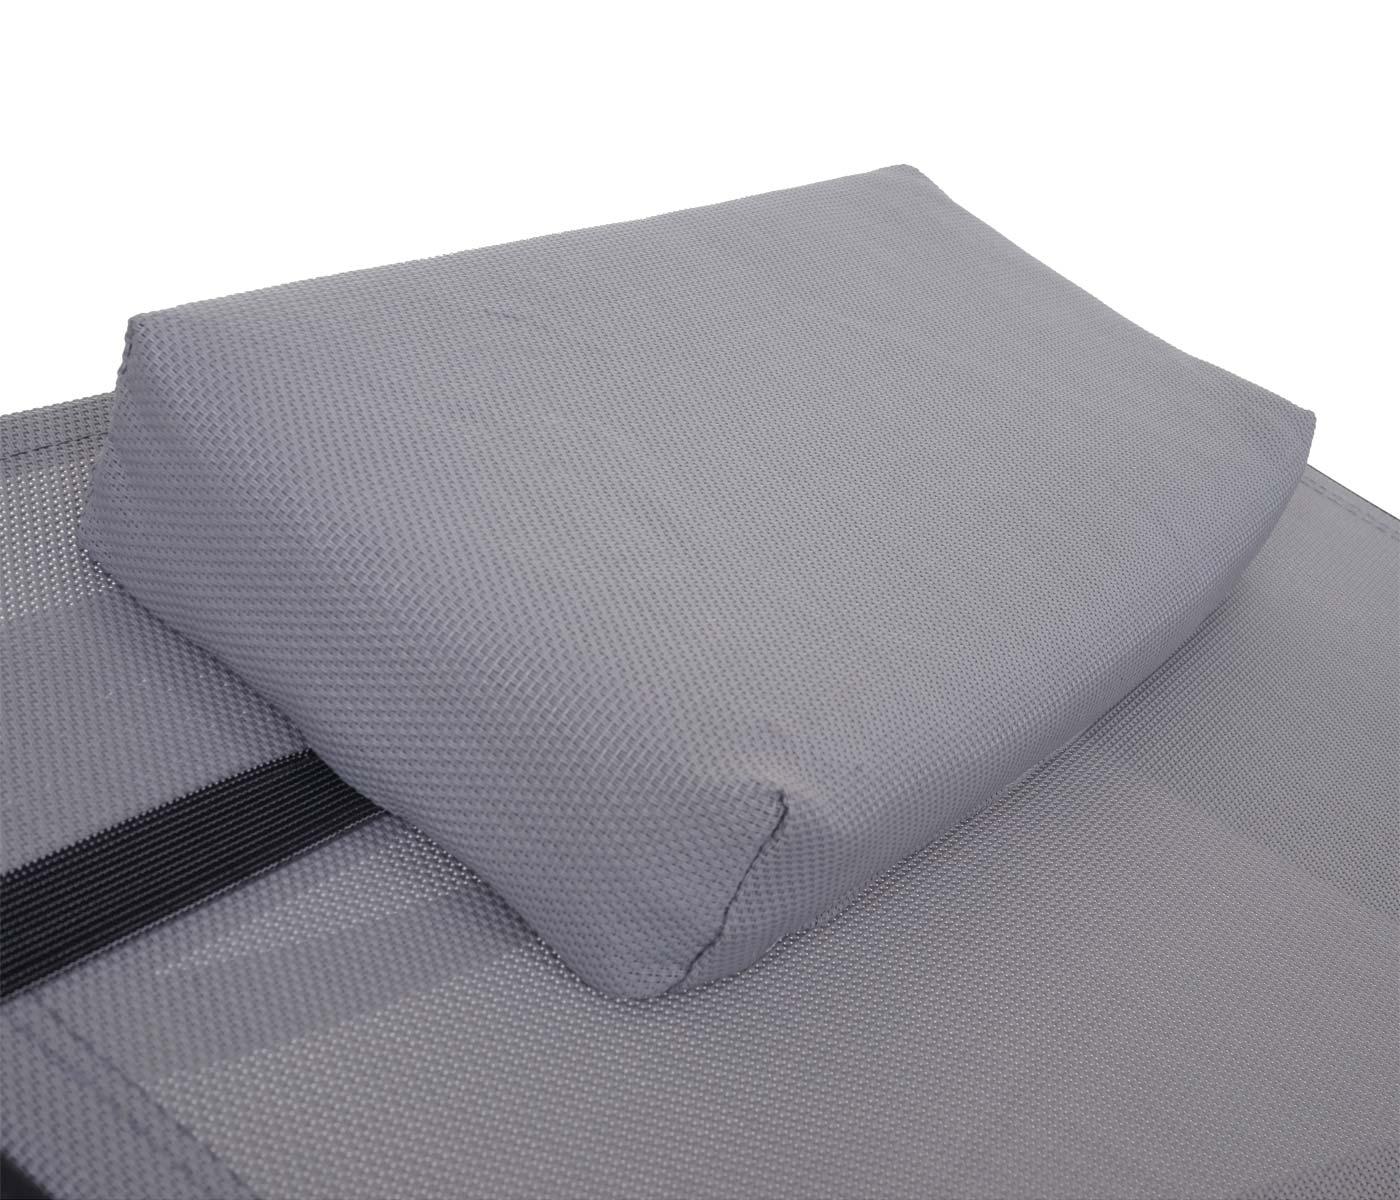 sonnenliege phoenix relaxliege gartenliege liege poly rattan braun meliert bezug grau. Black Bedroom Furniture Sets. Home Design Ideas